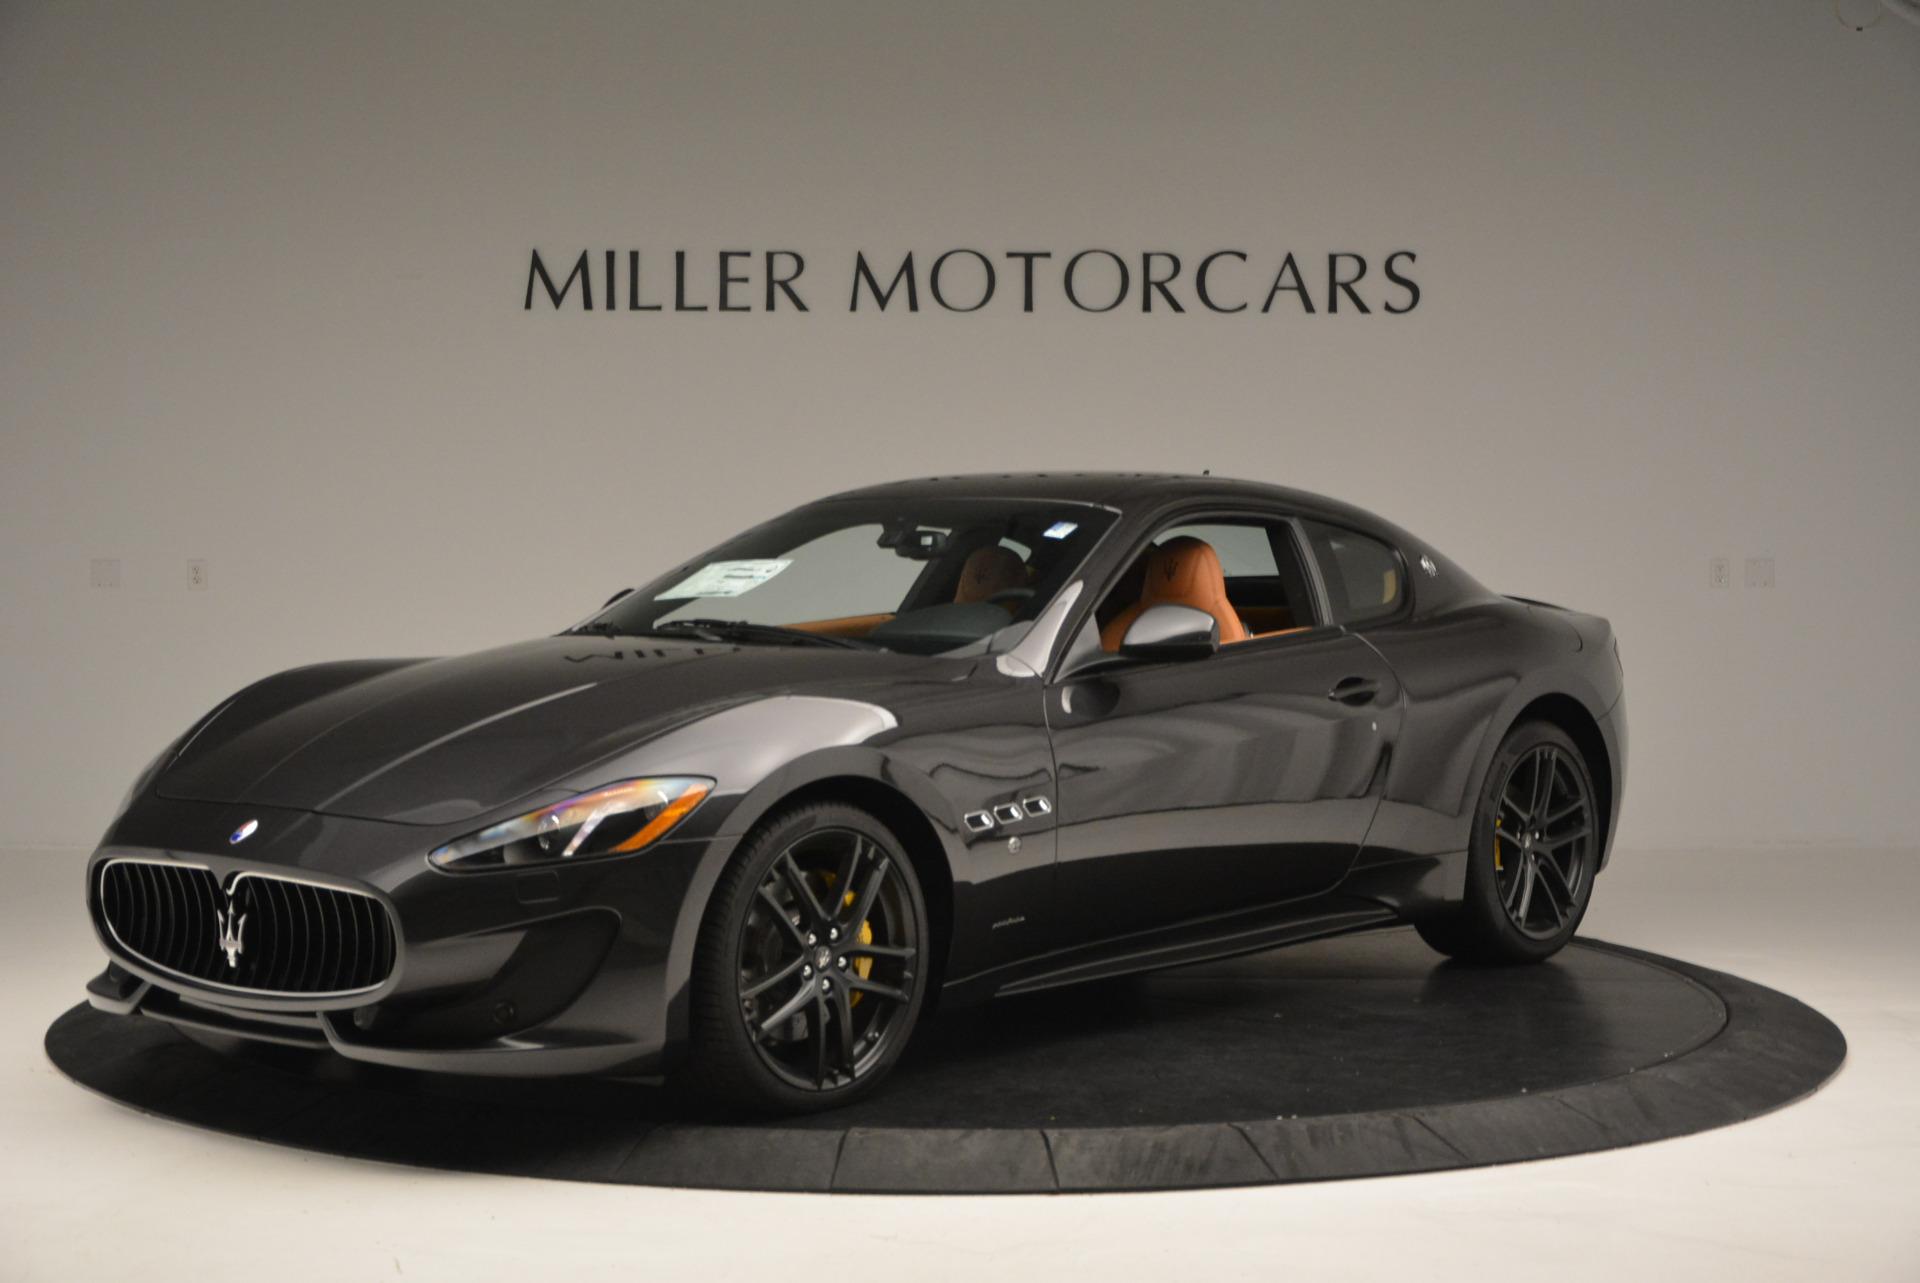 New 2017 Maserati GranTurismo Sport For Sale In Westport, CT 593_p2